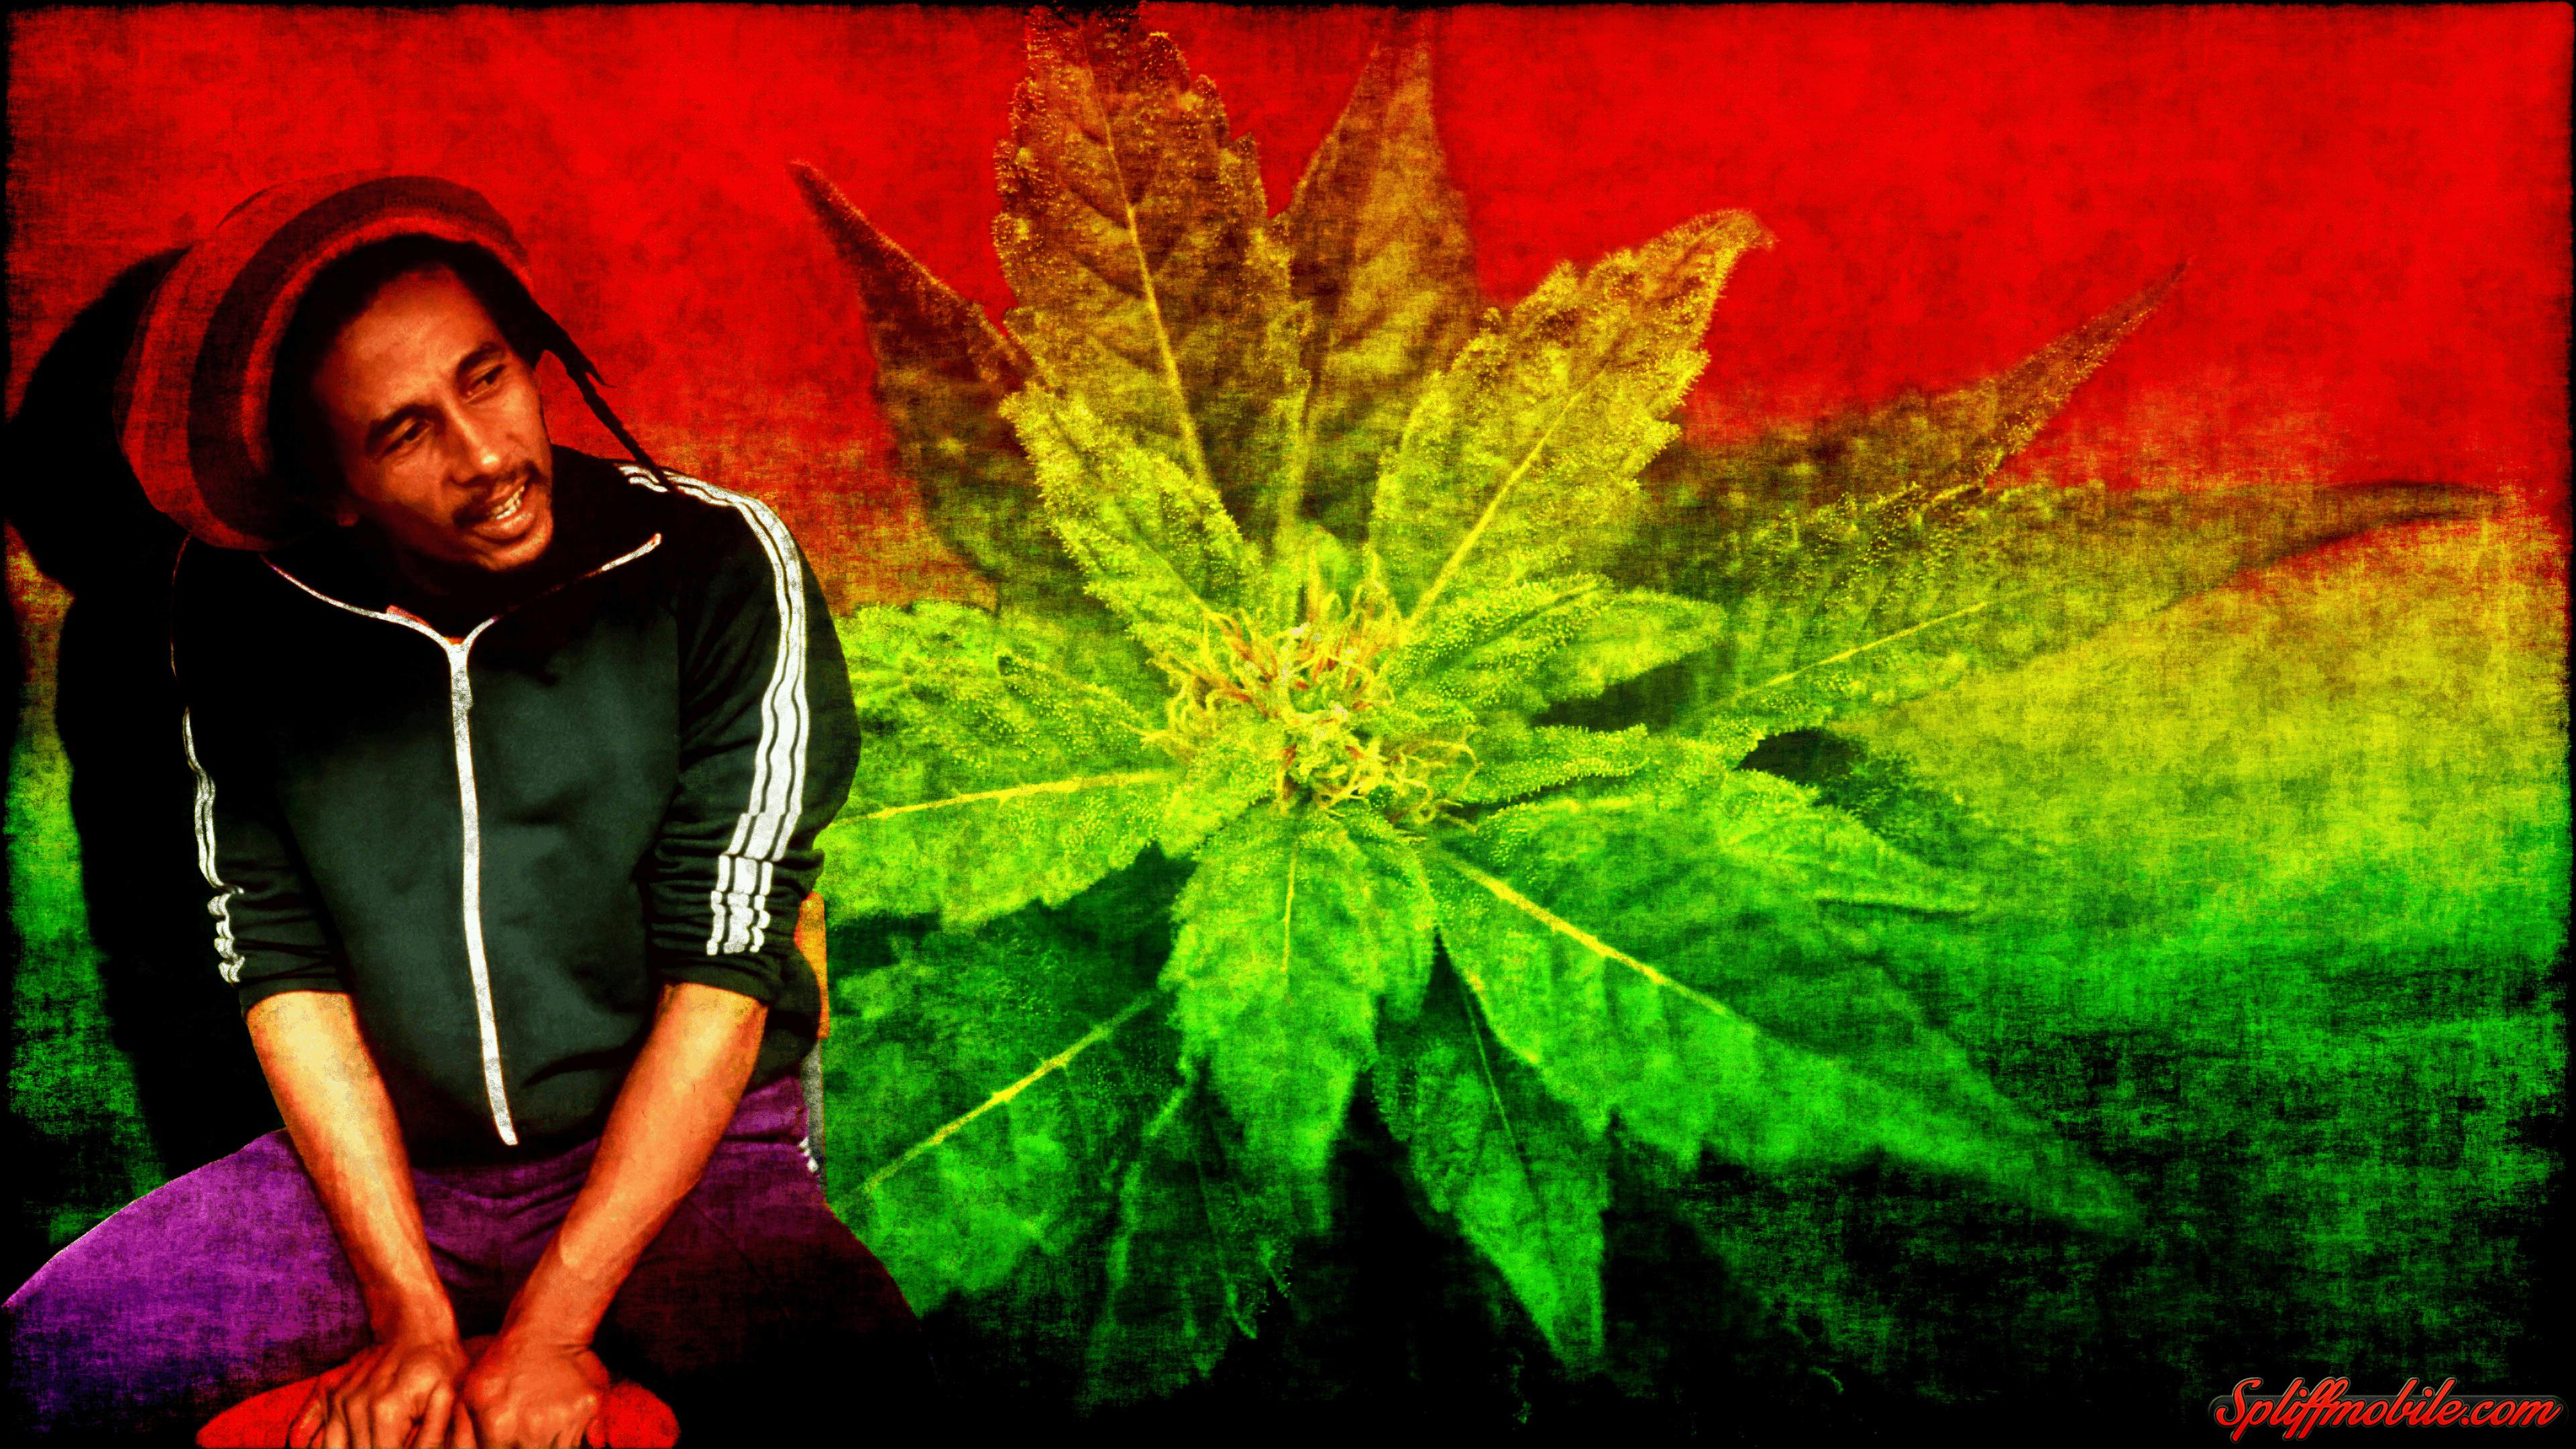 Download HD Bob Marley Wallpapers